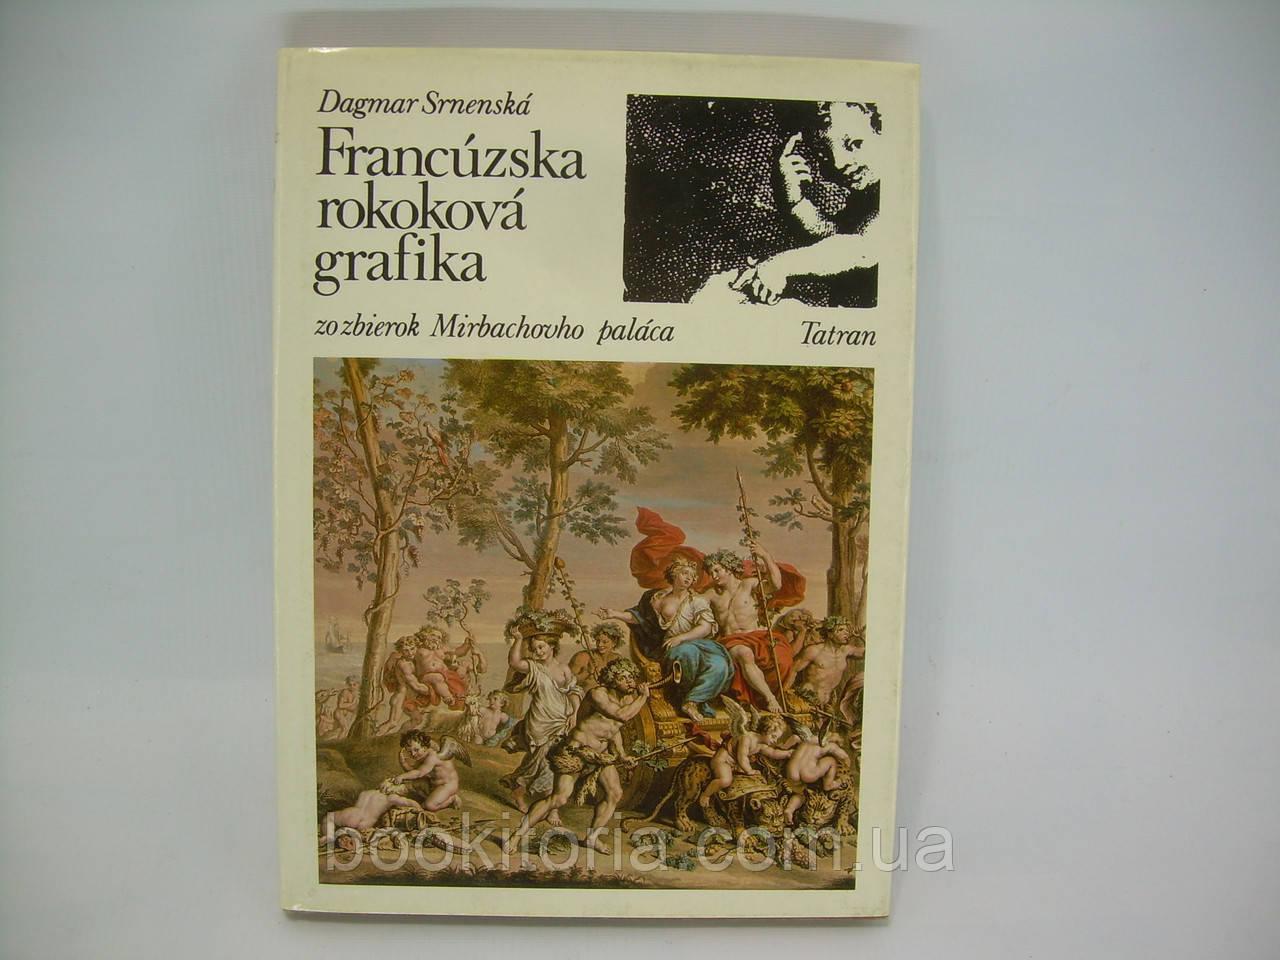 Dagmar Srnenska/Дагмар Срненска. Francuzska rokokova grafika. / Французская графика рококо (б/у).